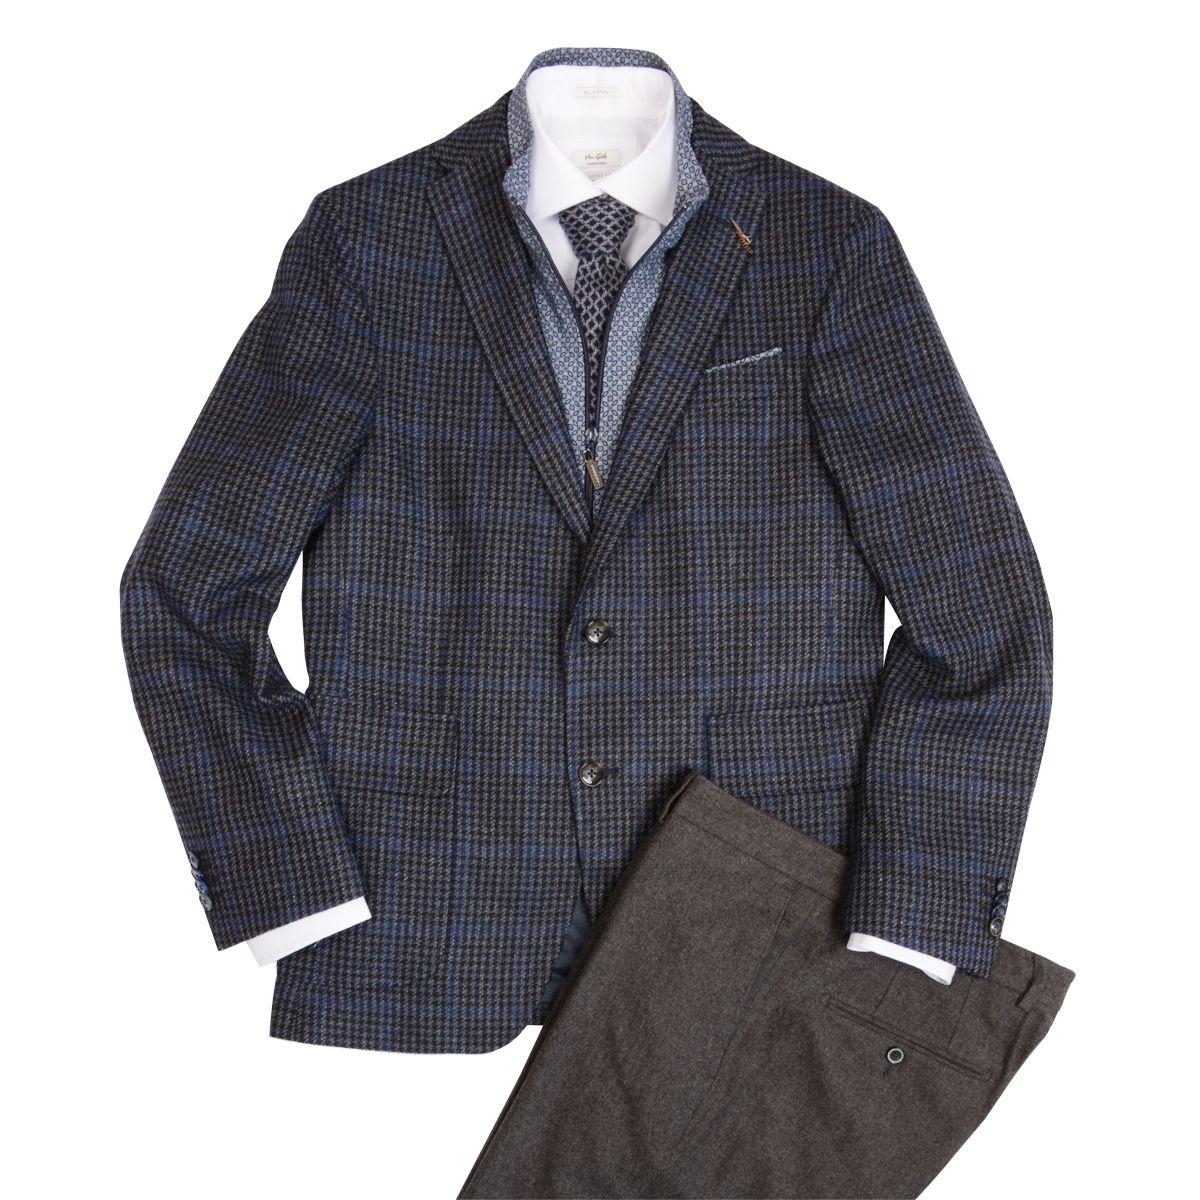 Veston • 650 $ Chemise • 145 $ Cravate Paolo Albizzati • 175 $ Pantalon • 185 $ .VAN GILS | Jacket • $650  Shirt • $145  Tie by Paolo Albizzati • 175 $ Trousers • $185